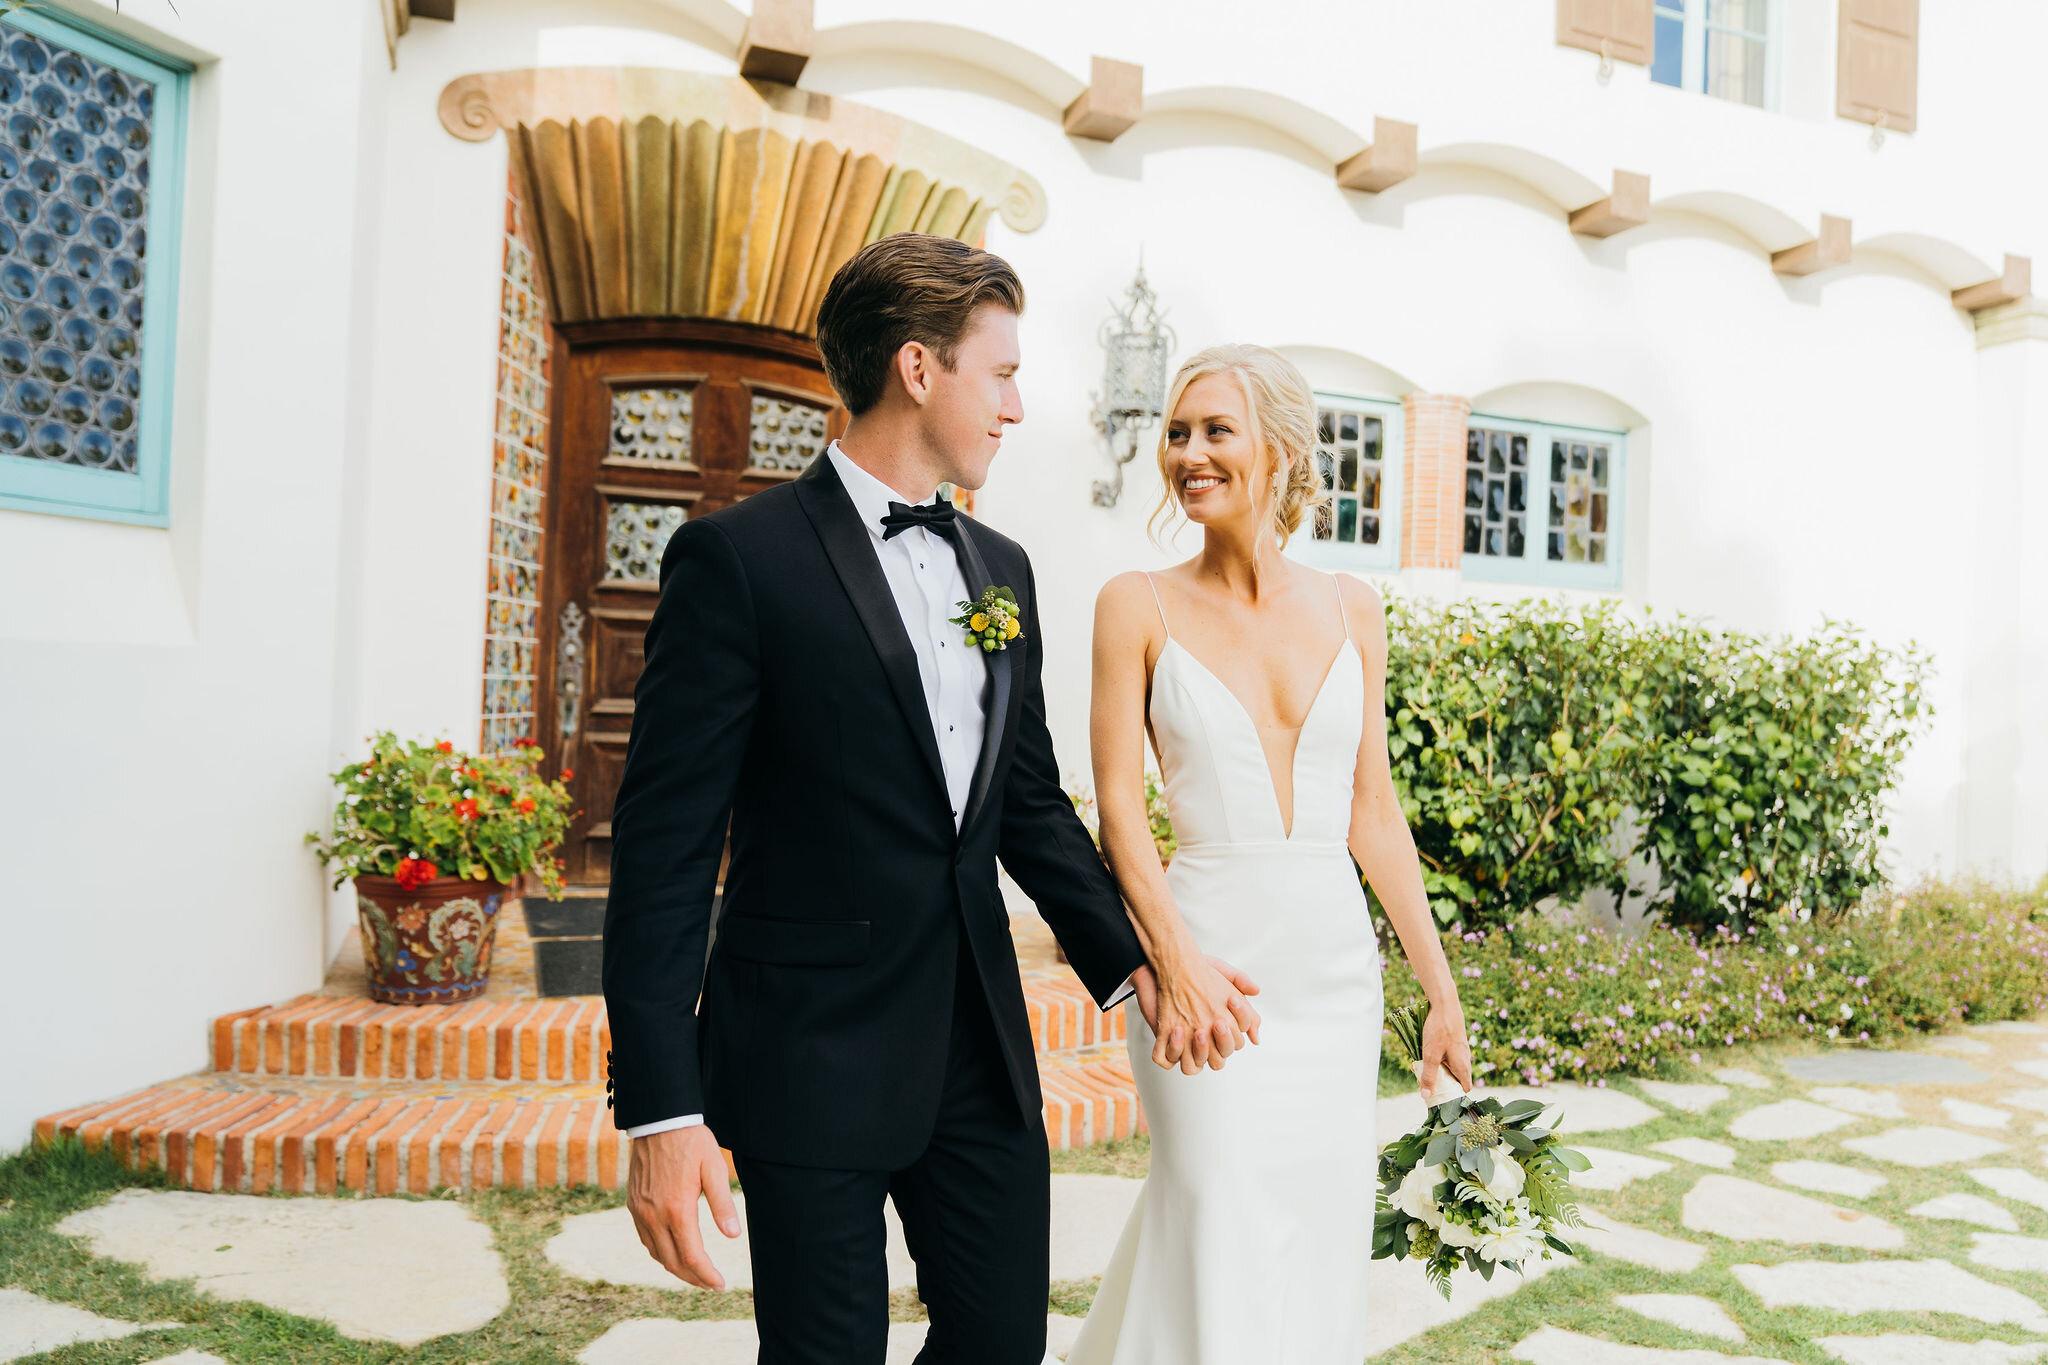 adamson-house-wedding-photography-143.jpg